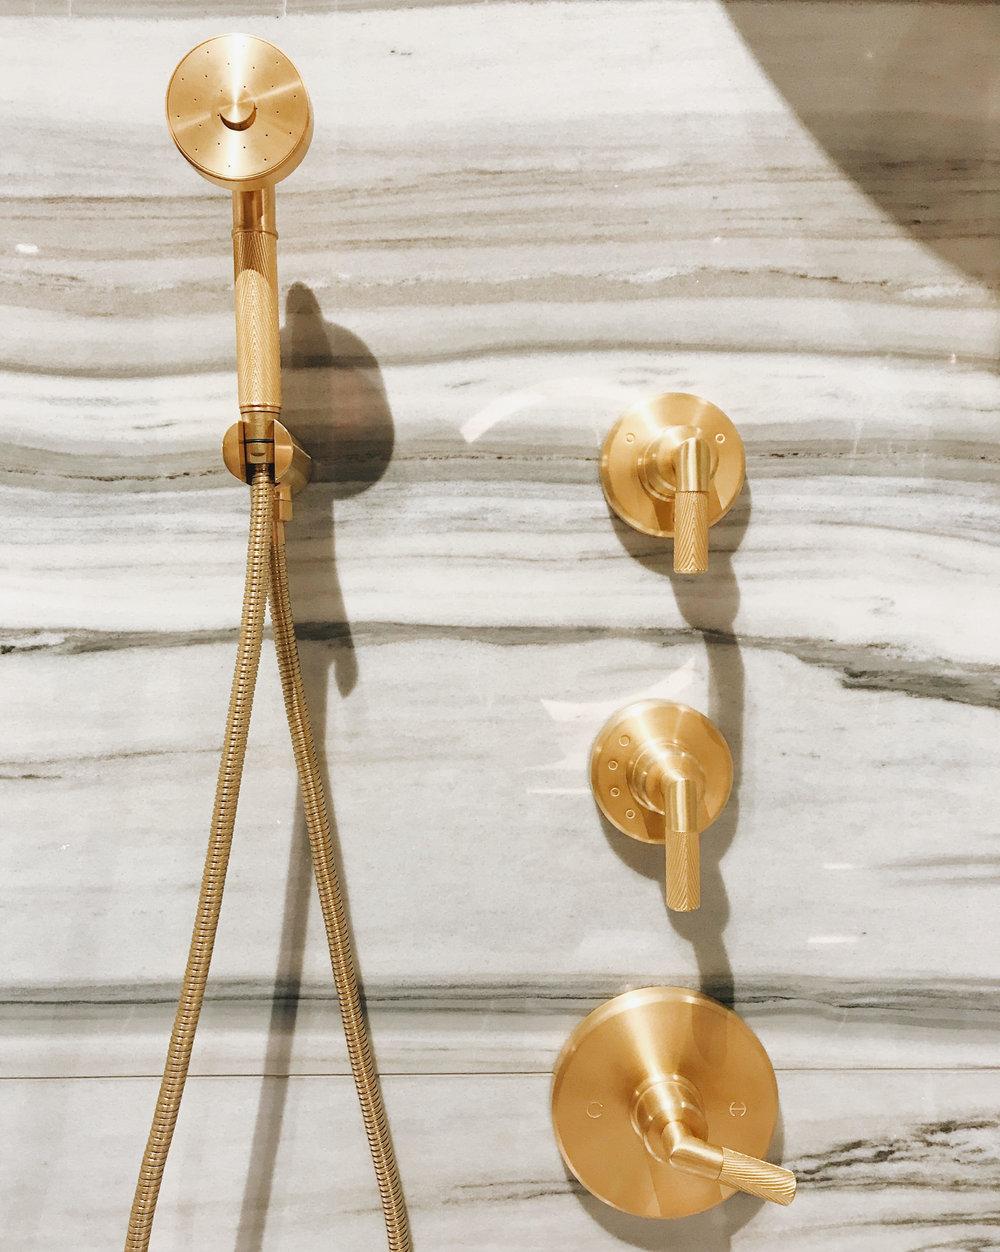 Kallista Laura Kirar   Pinna Paletta Hand Shower   in Unlaquered Brass